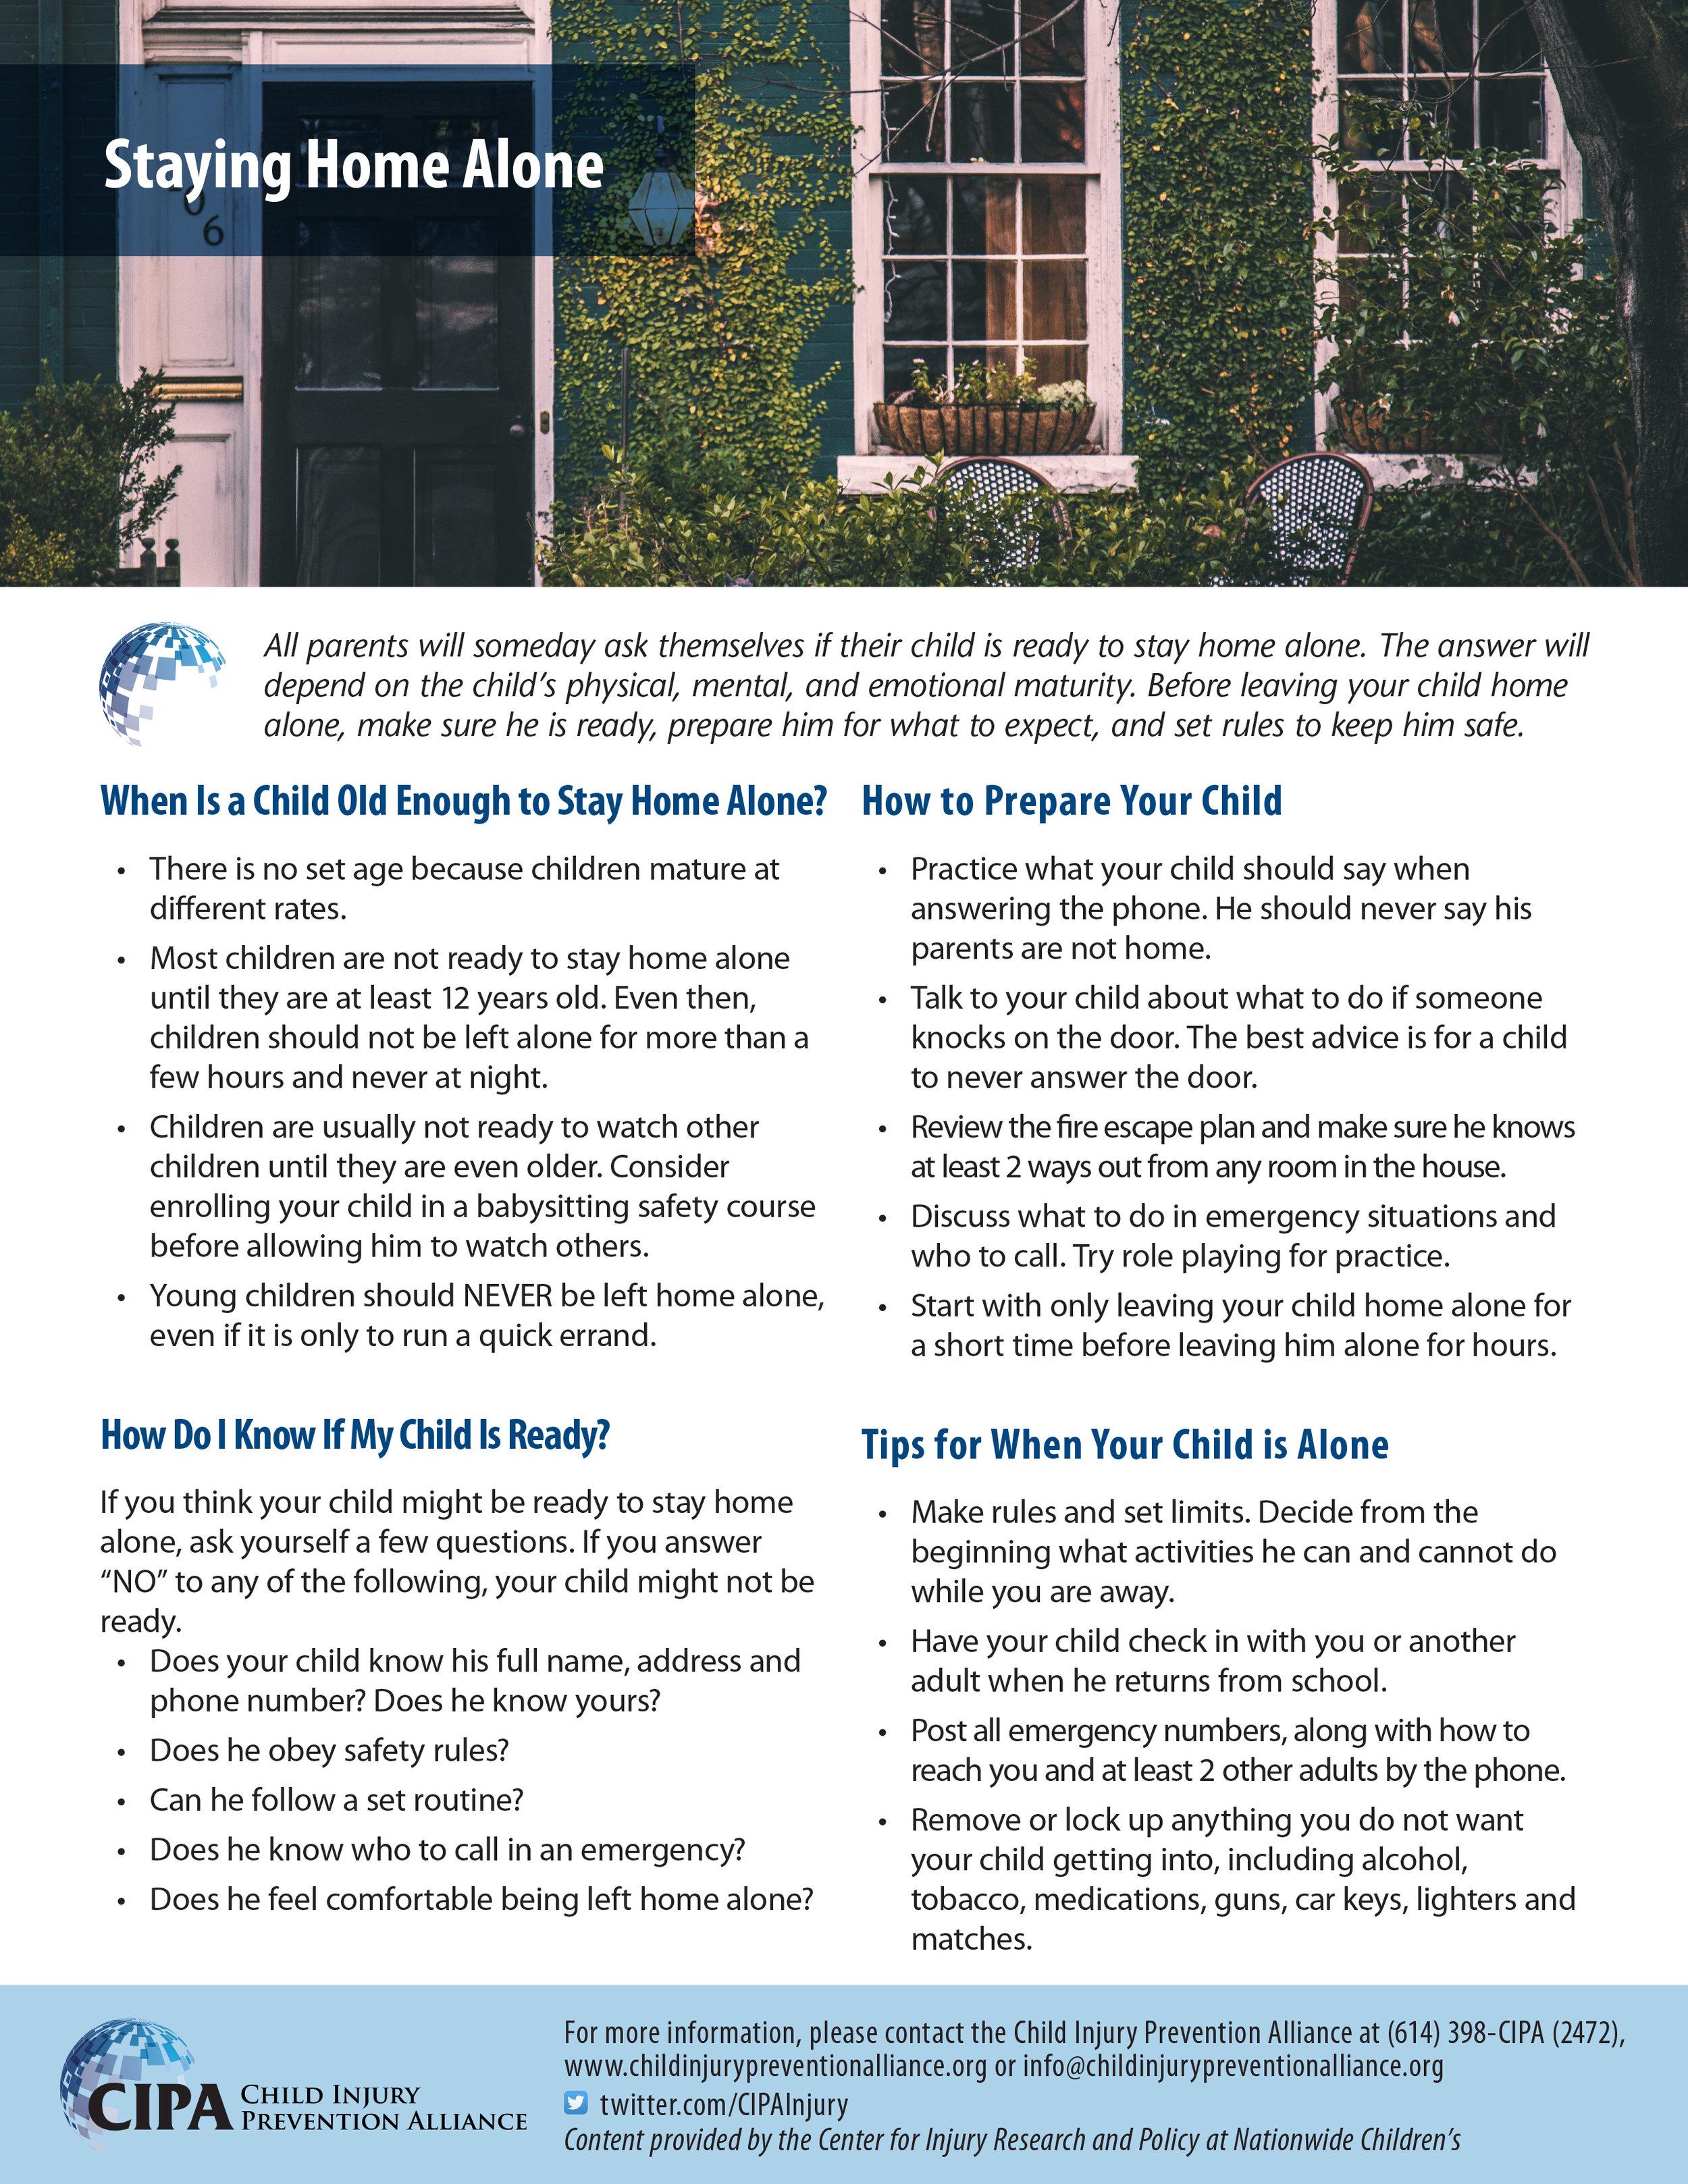 staying-home-alone-fact-sheet.jpg